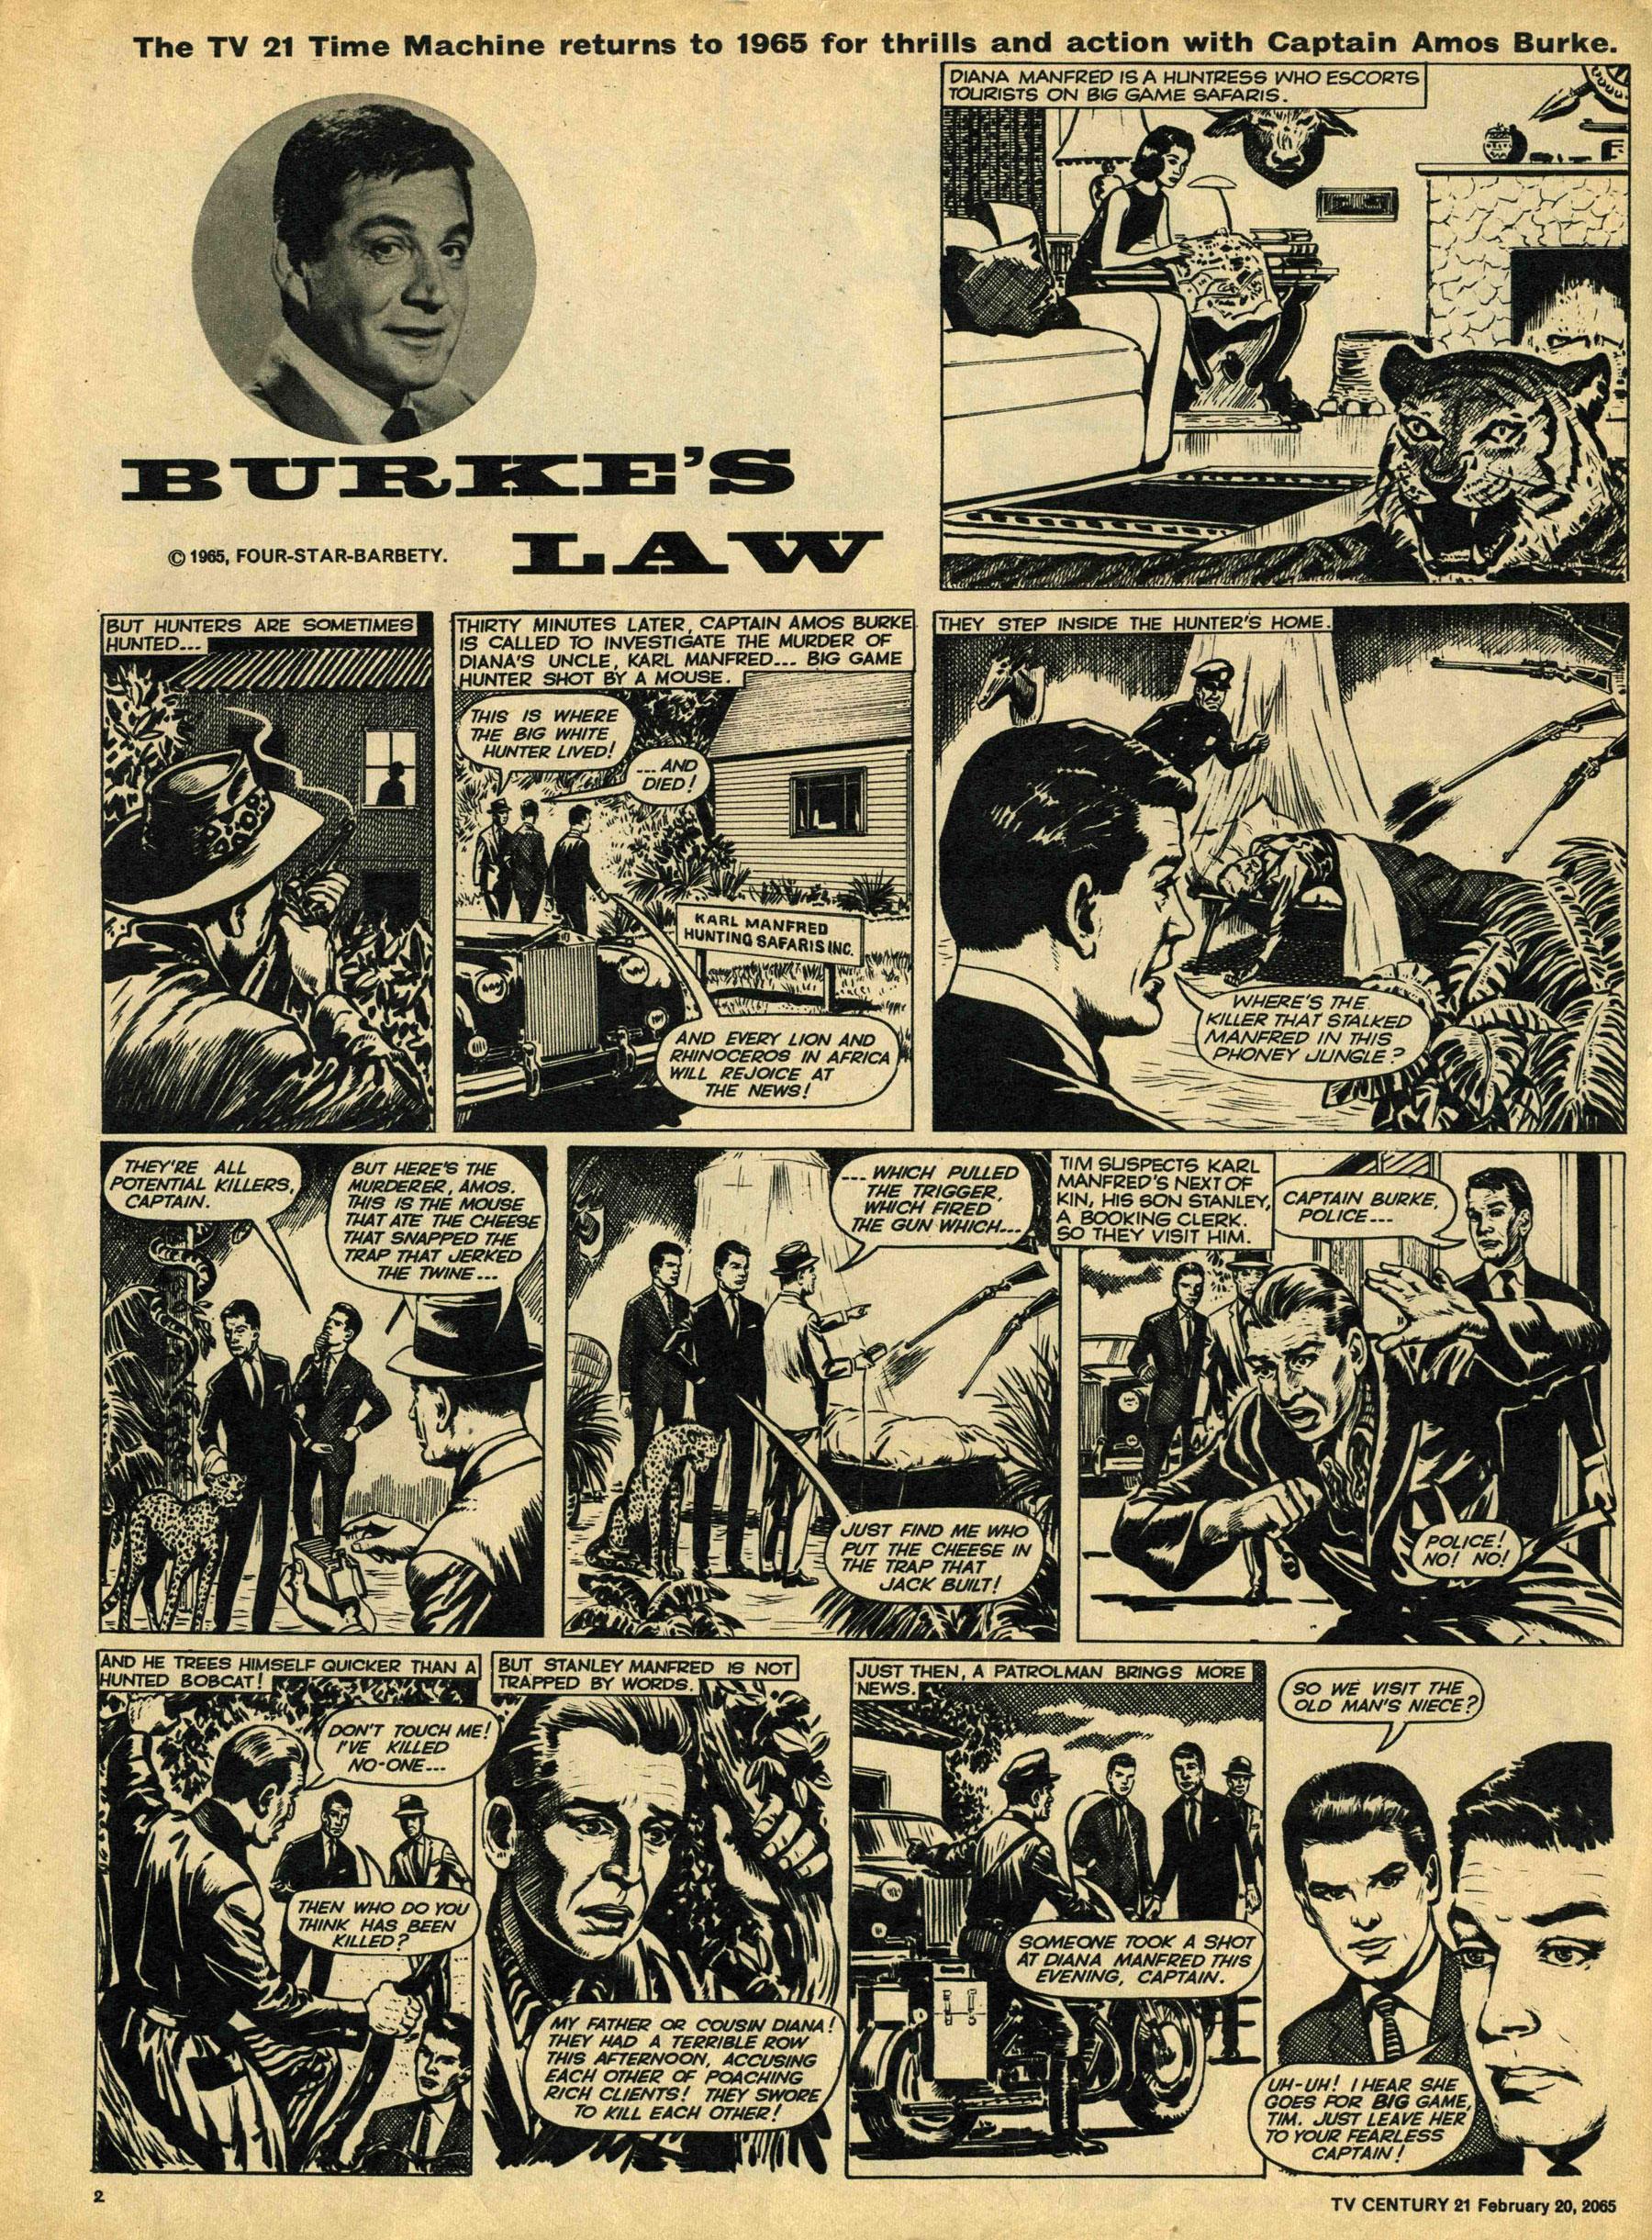 Read online TV Century 21 (TV 21) comic -  Issue #5 - 2